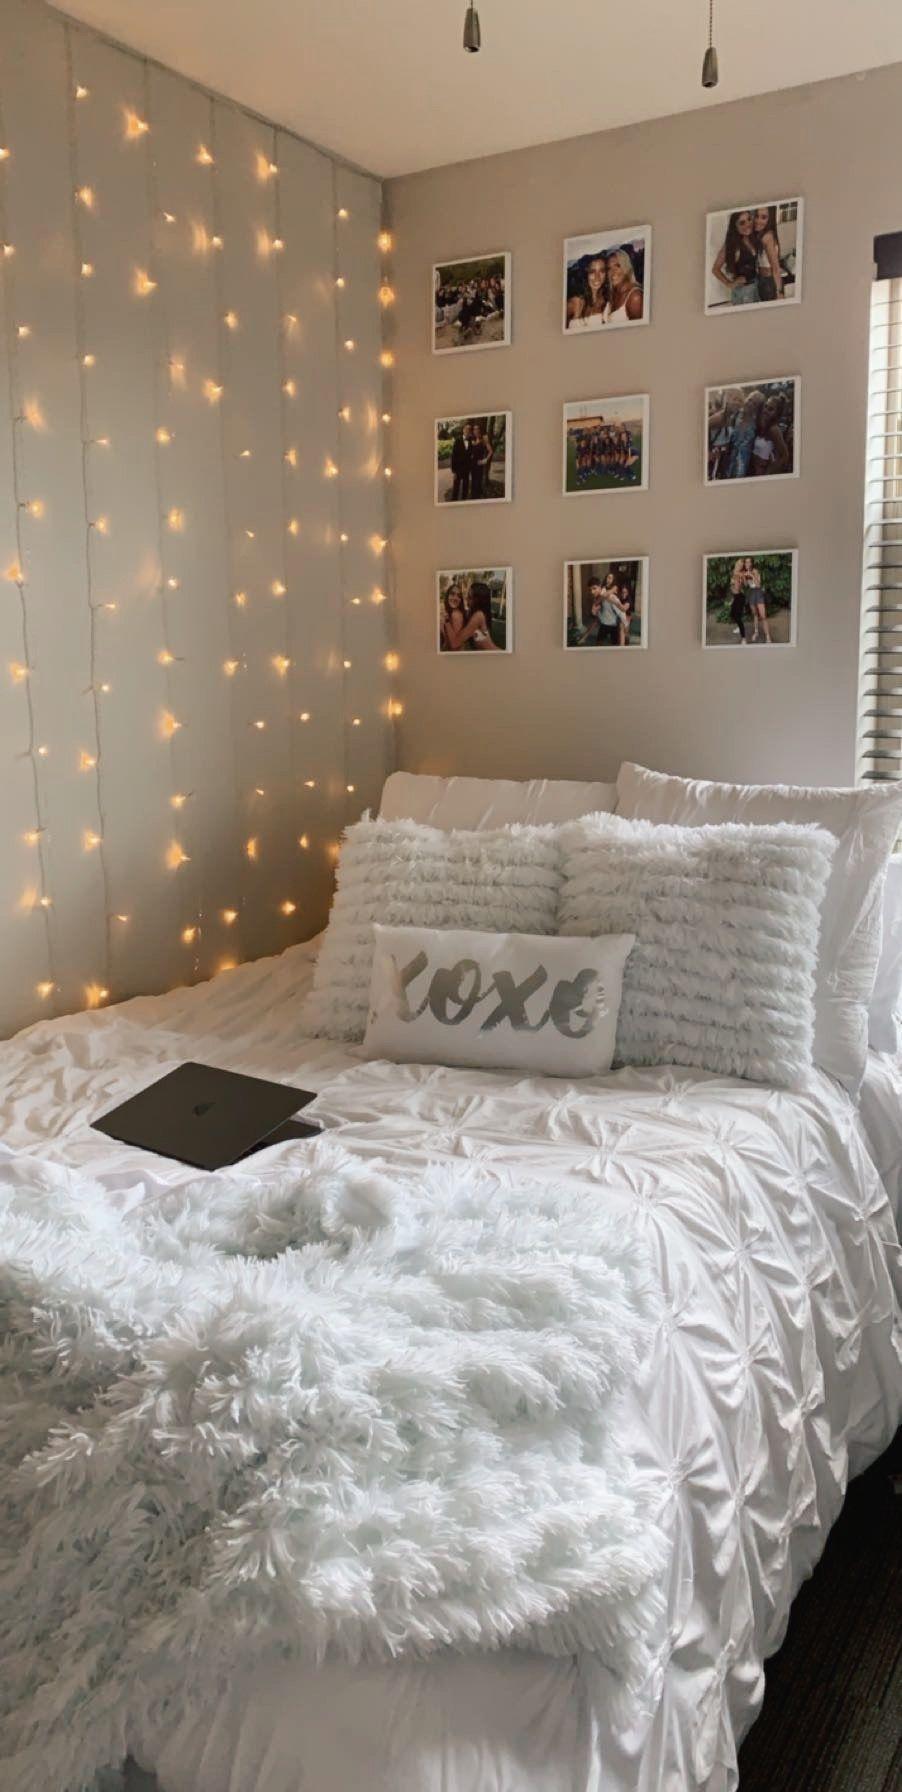 College Dorm Decorations In 2020 Room Inspiration Bedroom Cozy Room Decor Room Ideas Bedroom